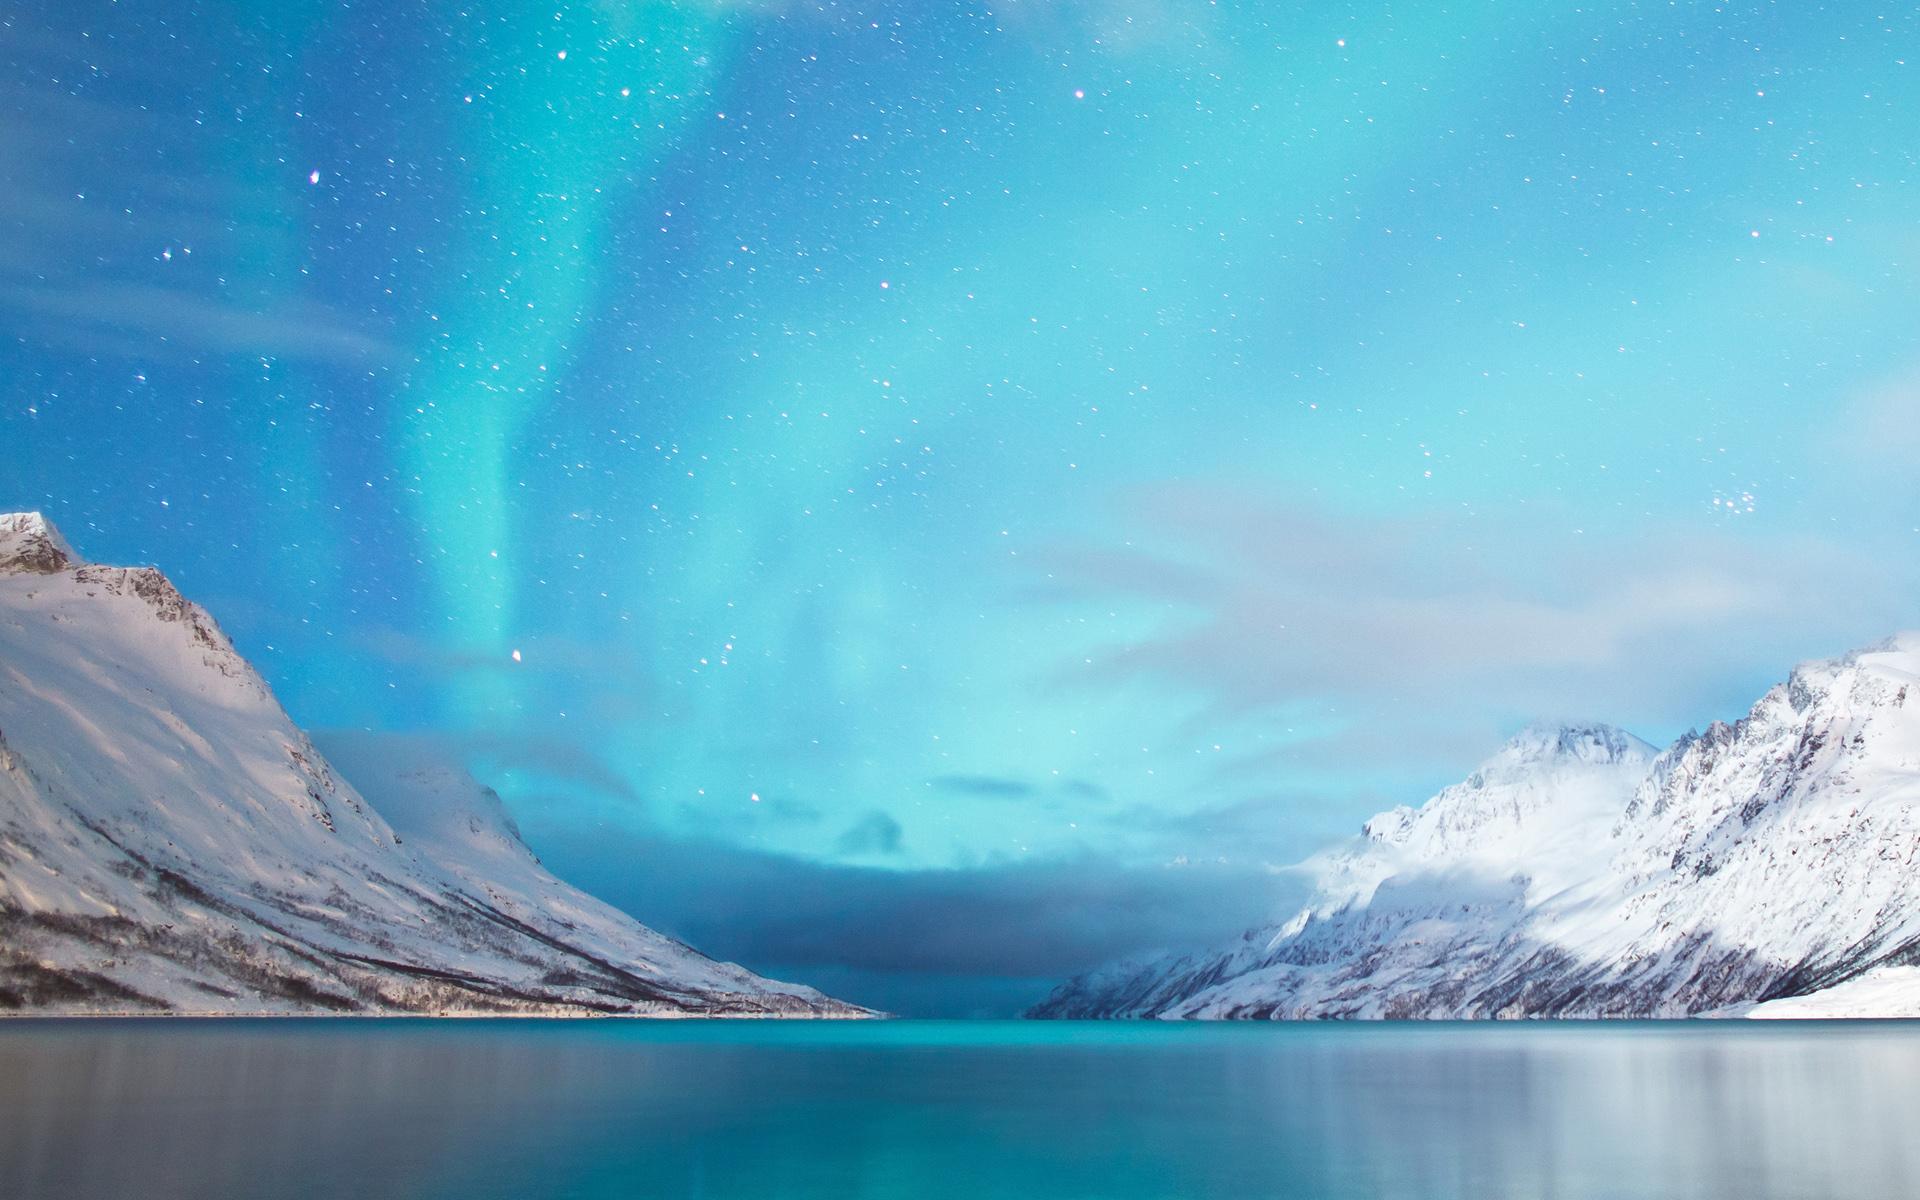 HD Wallpapers Polar Mountains